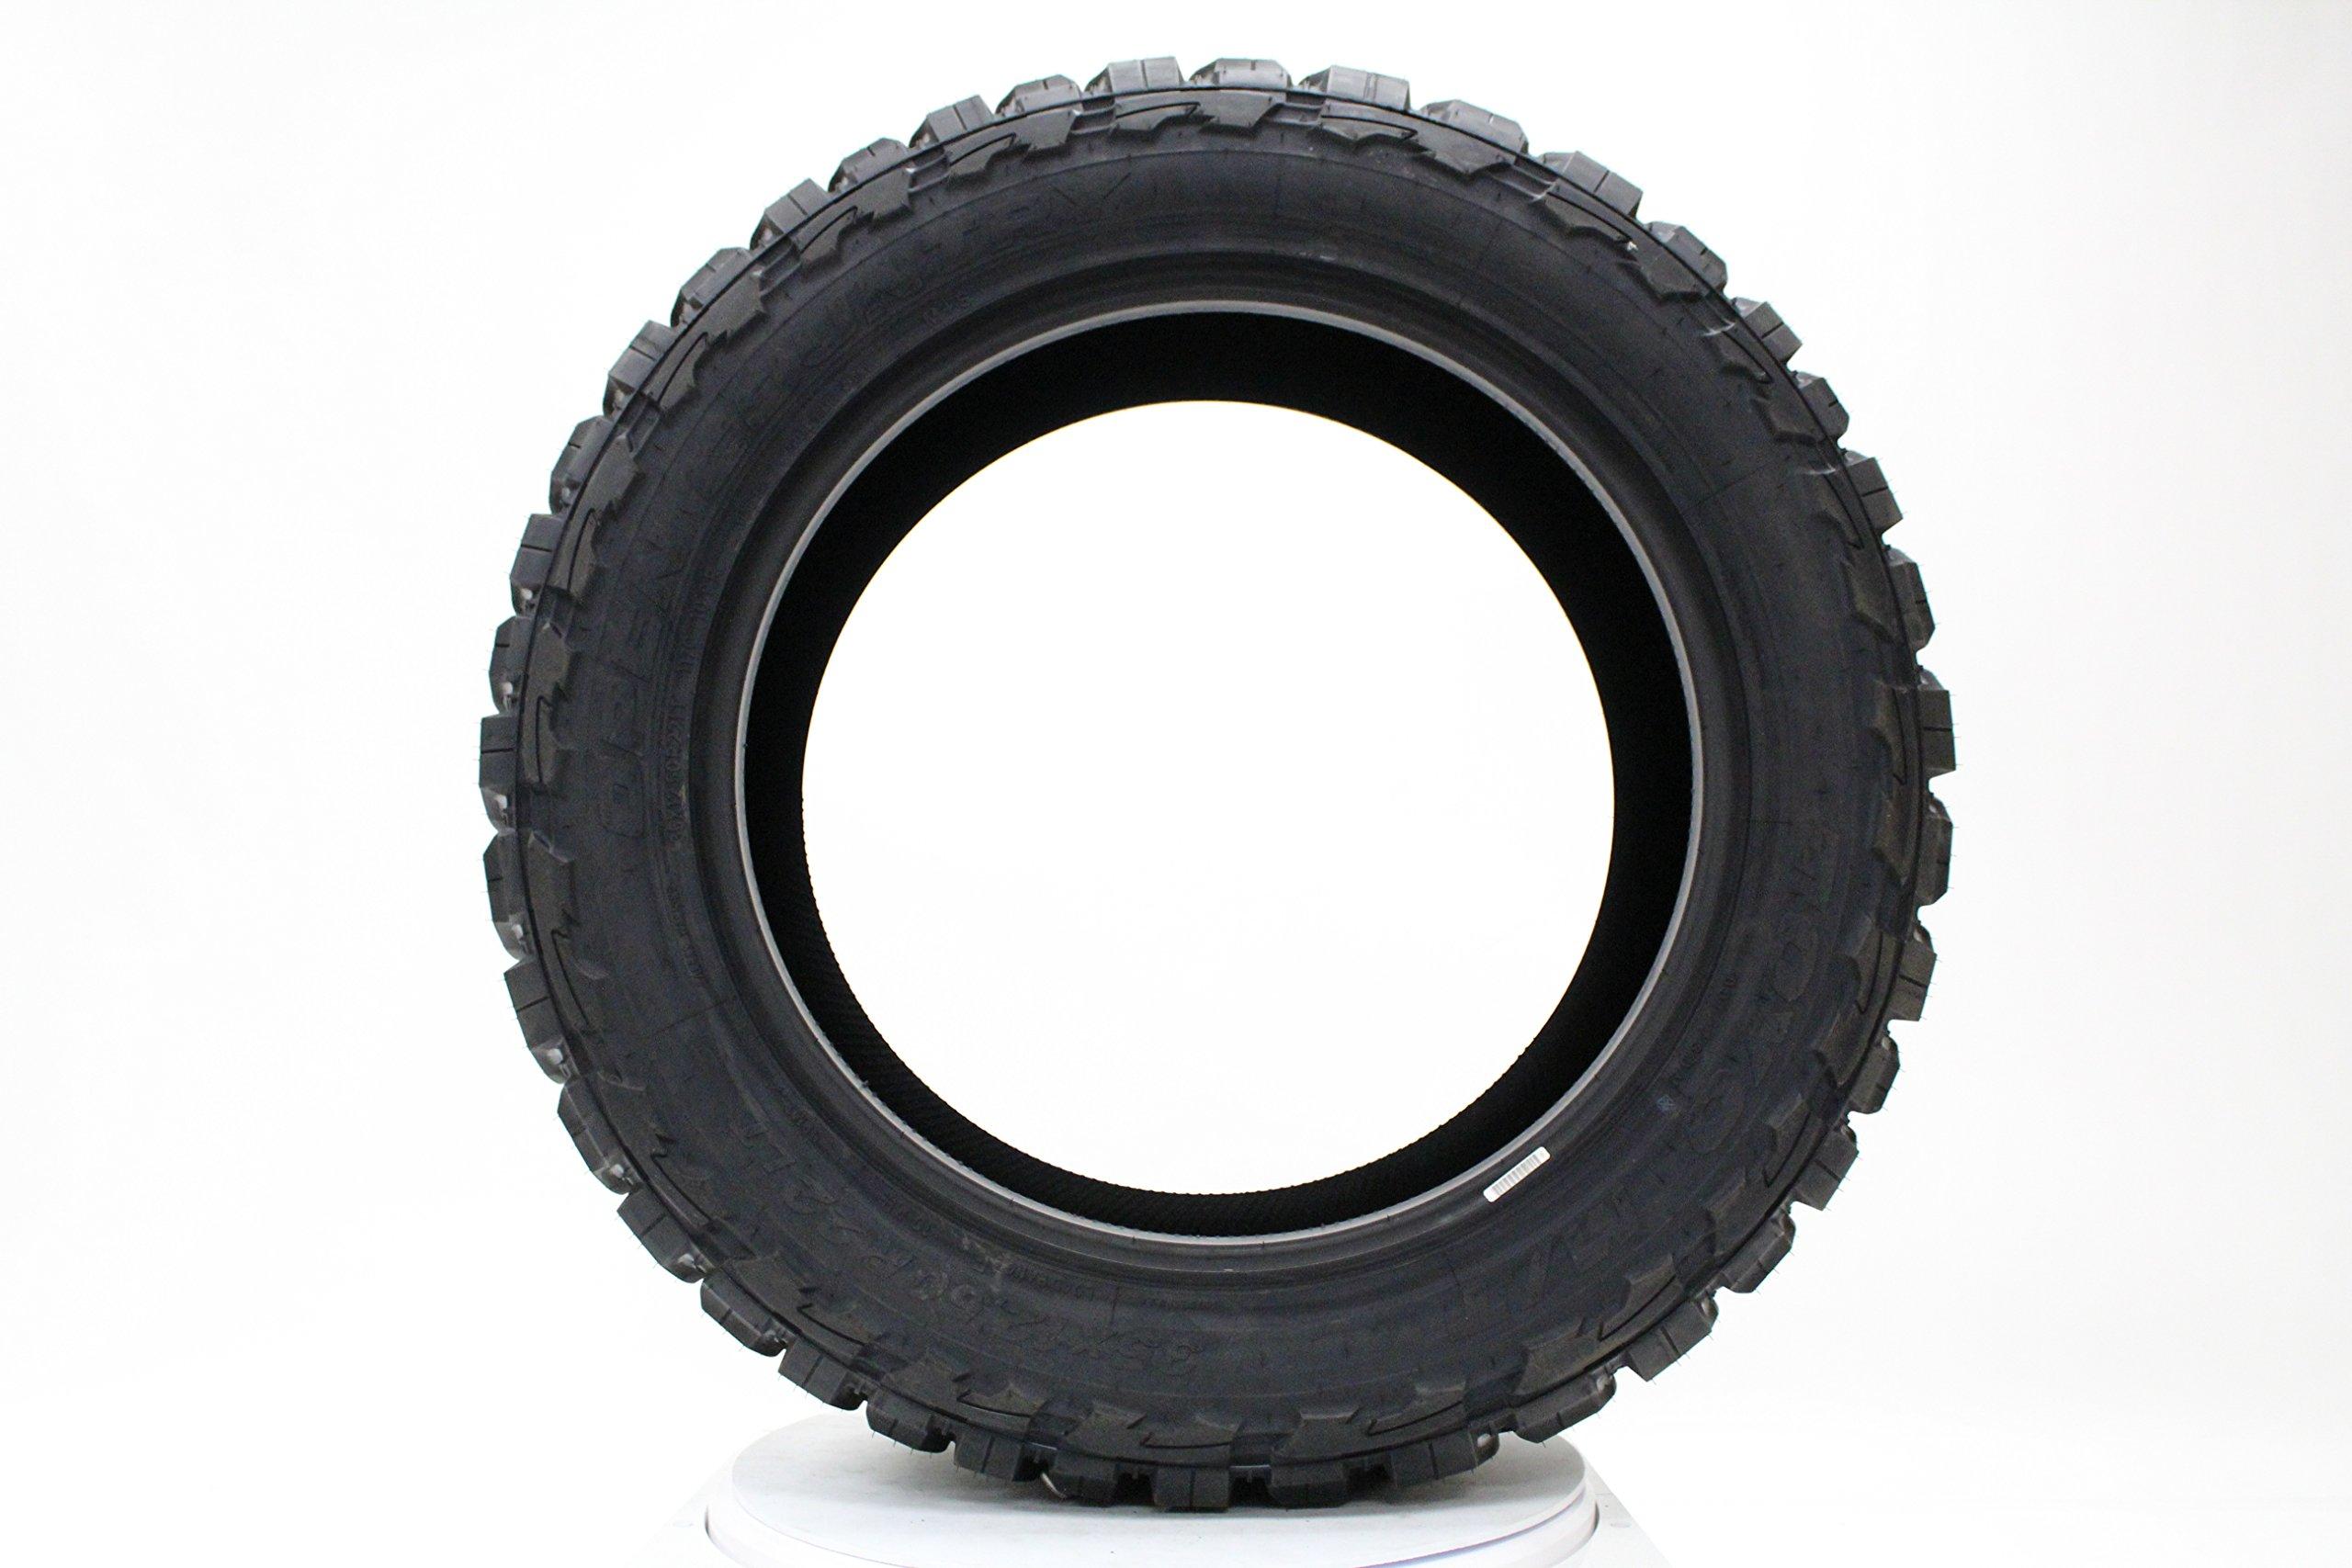 Toyo Tire Open Country M/T Mud-Terrain Tire – 35×12.50R17 125Q